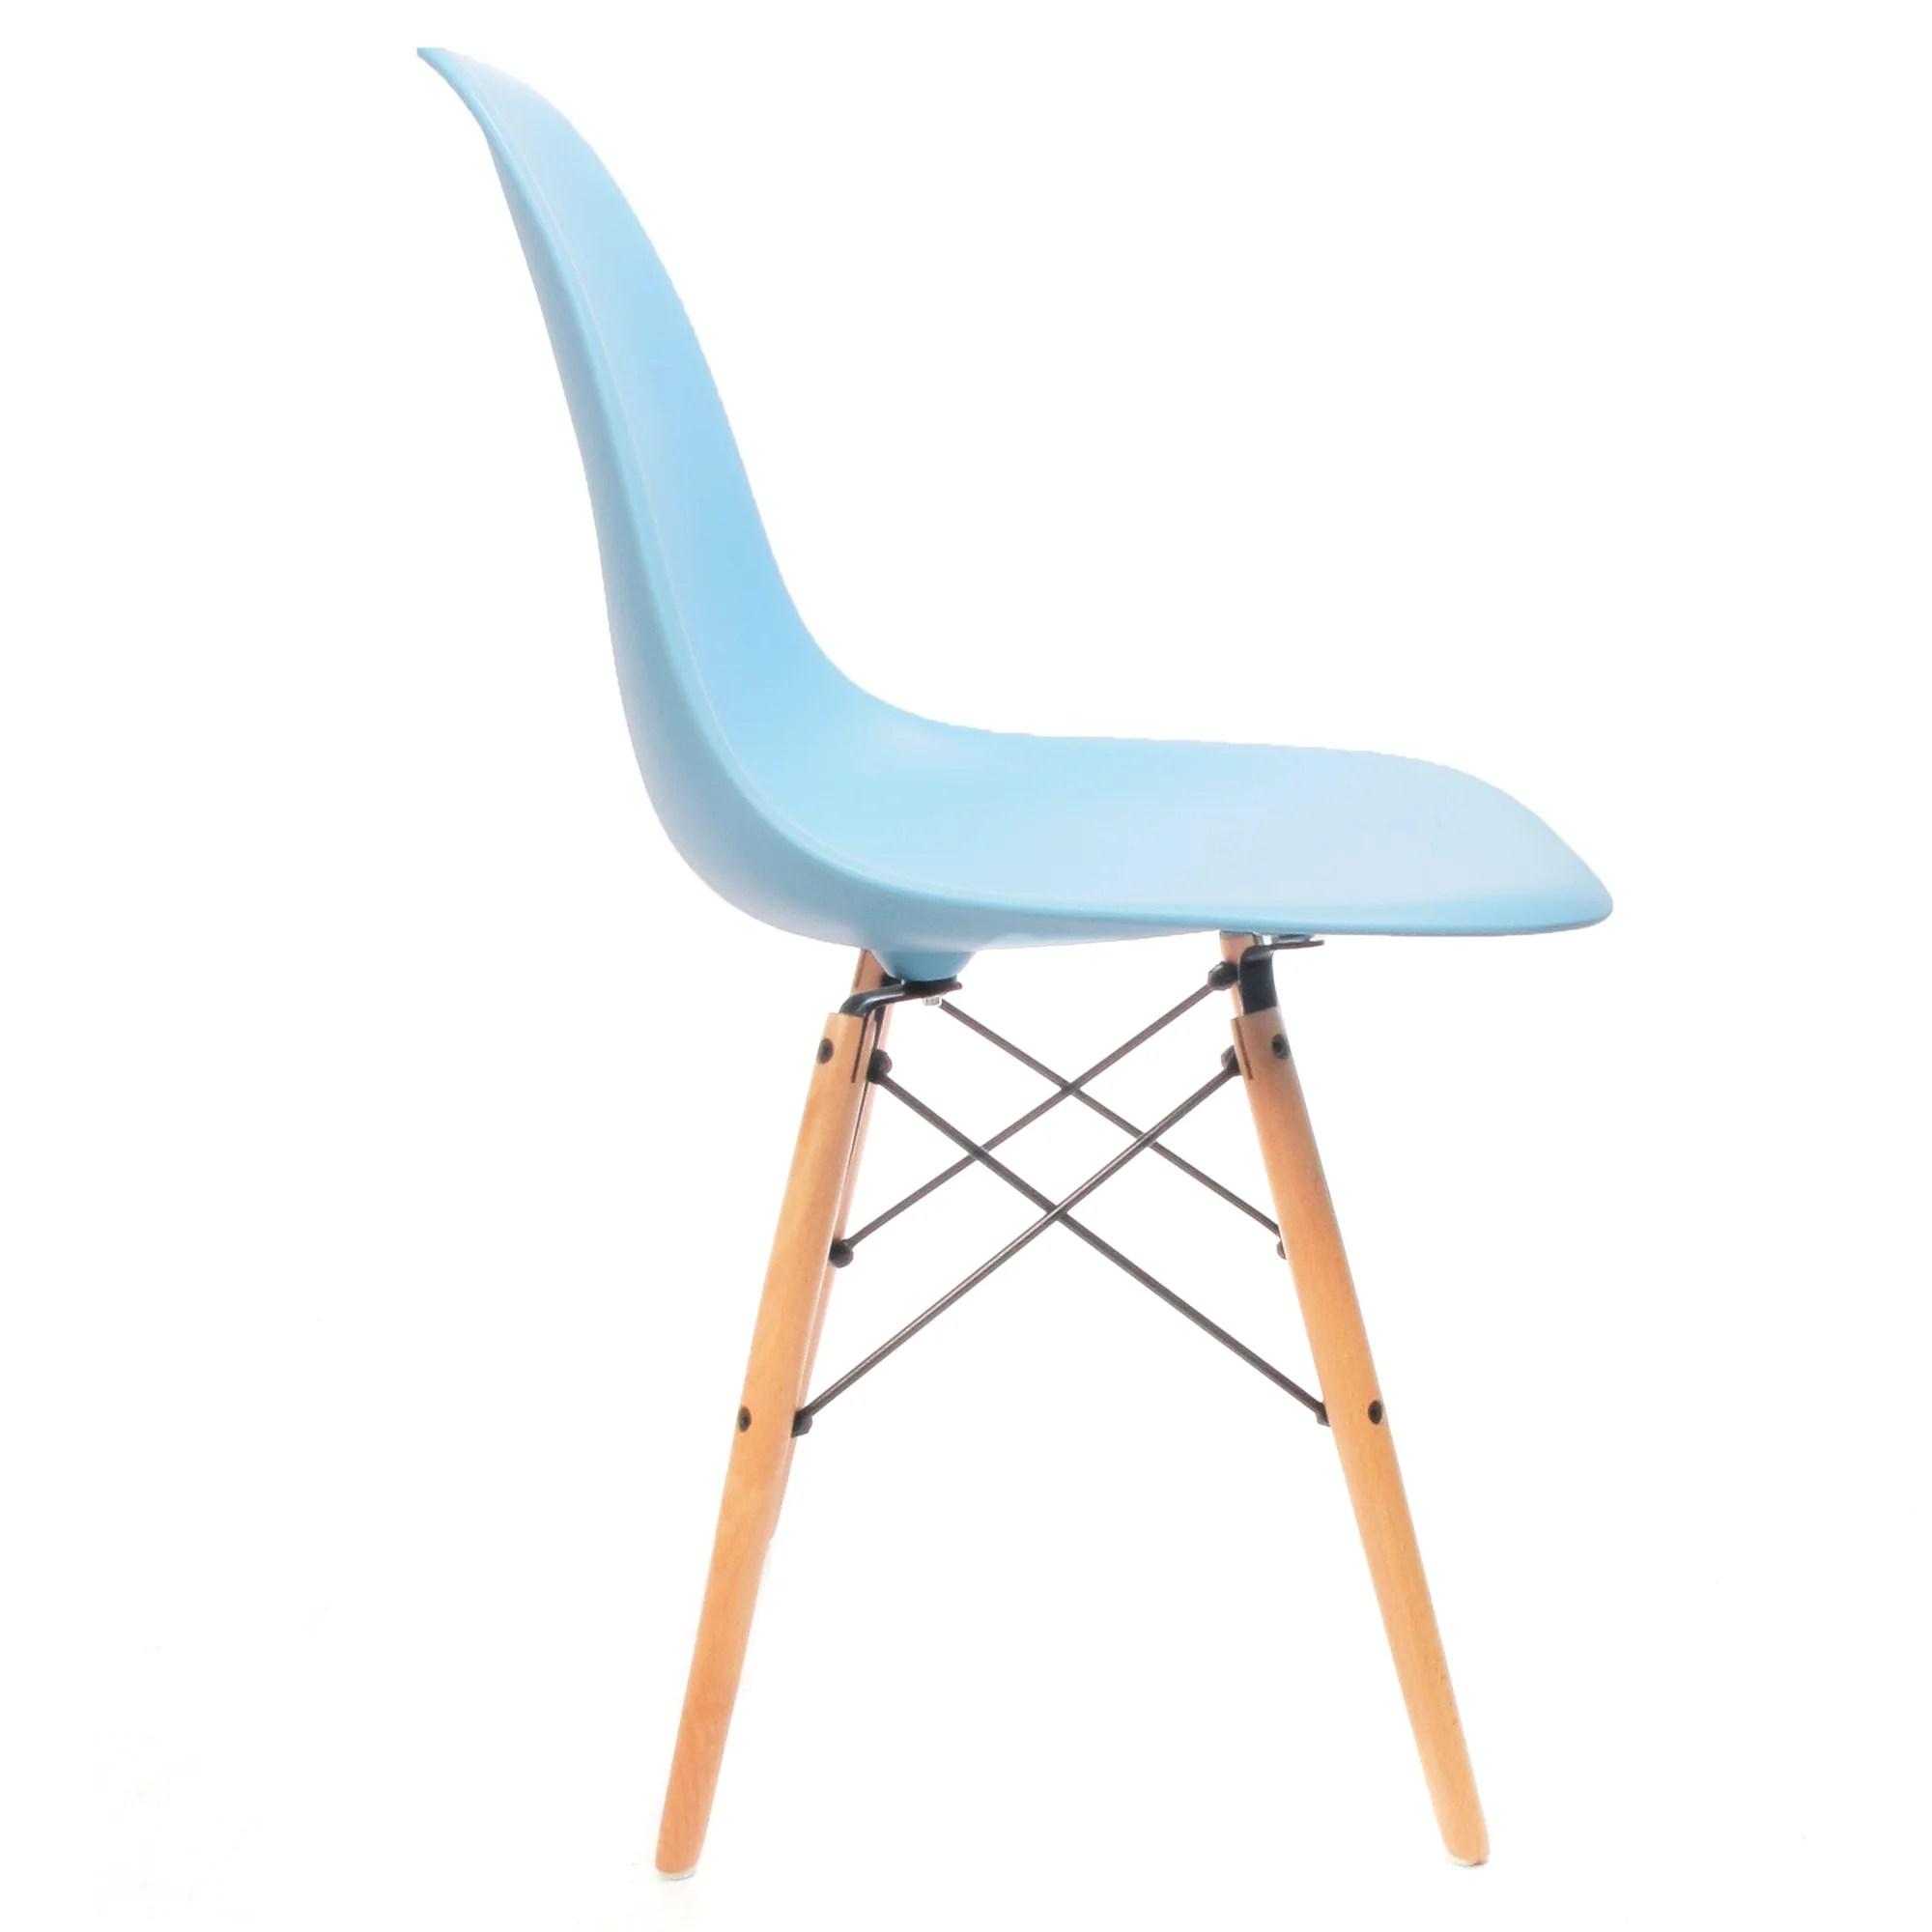 Eames DSW stuhl blau   Charles & Ray Eames chairs – Furnpact